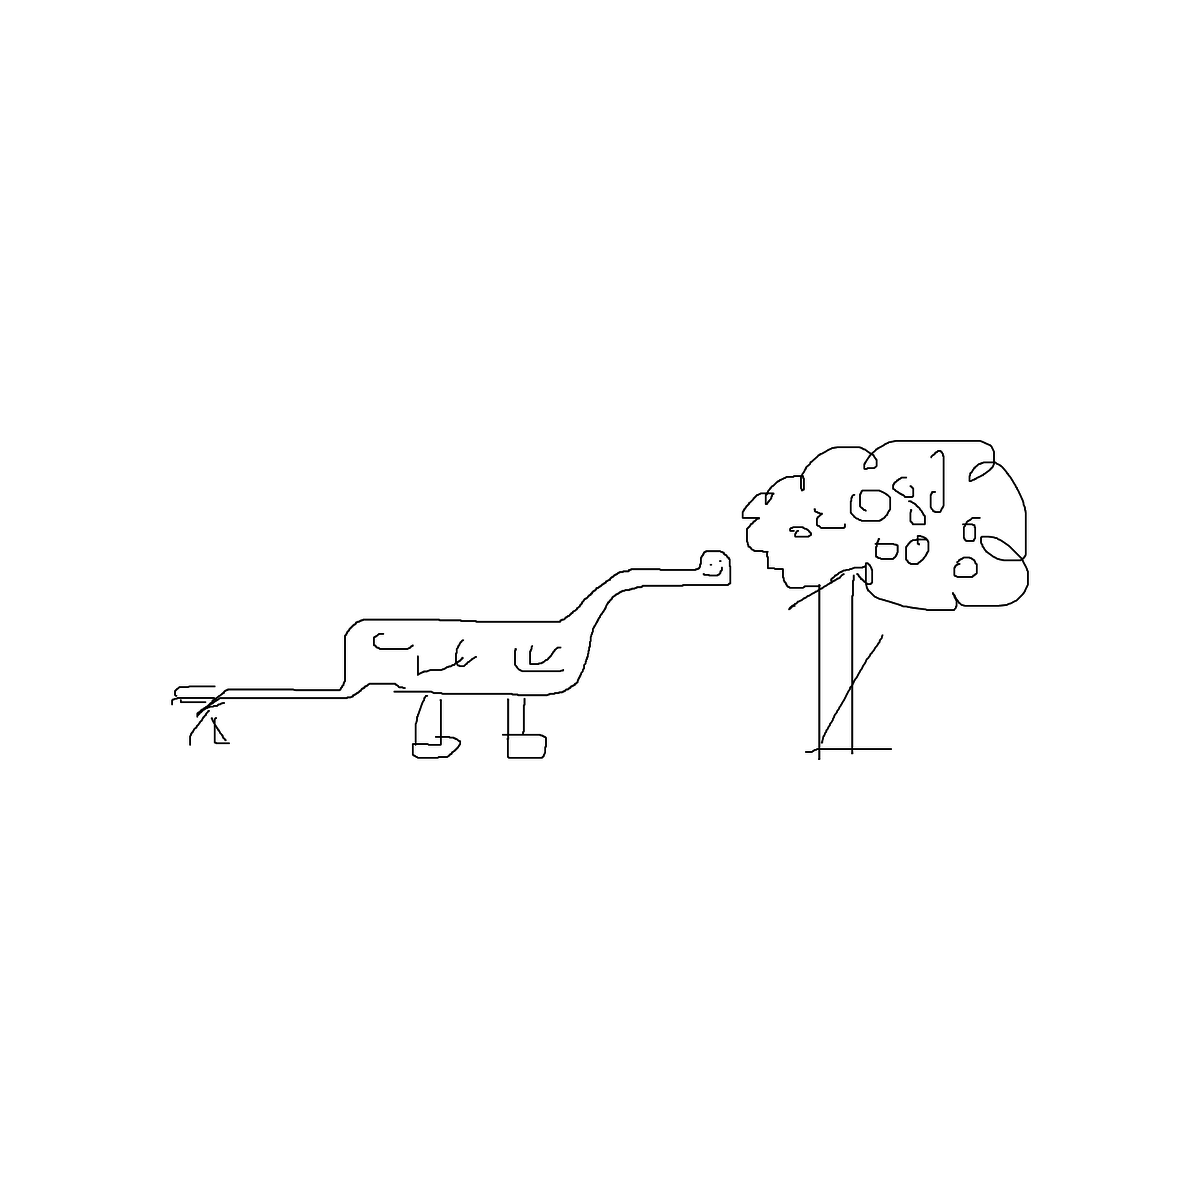 BAAAM drawing#12990 lat:52.7216758728027340lng: 6.4644684791564940